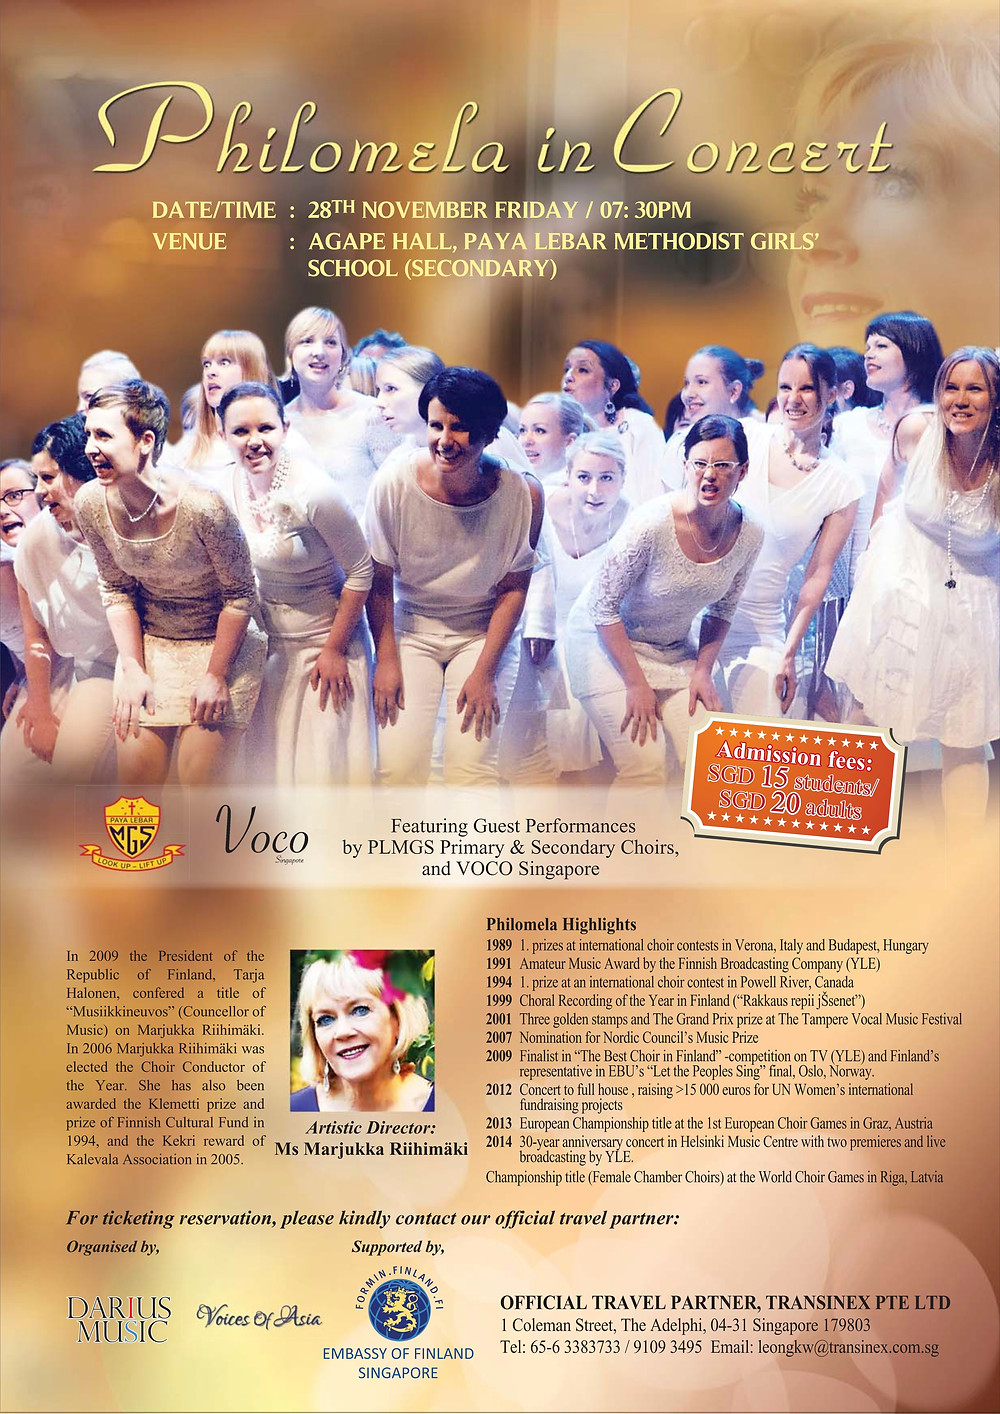 Philomela_In_Concert Flyer.jpg